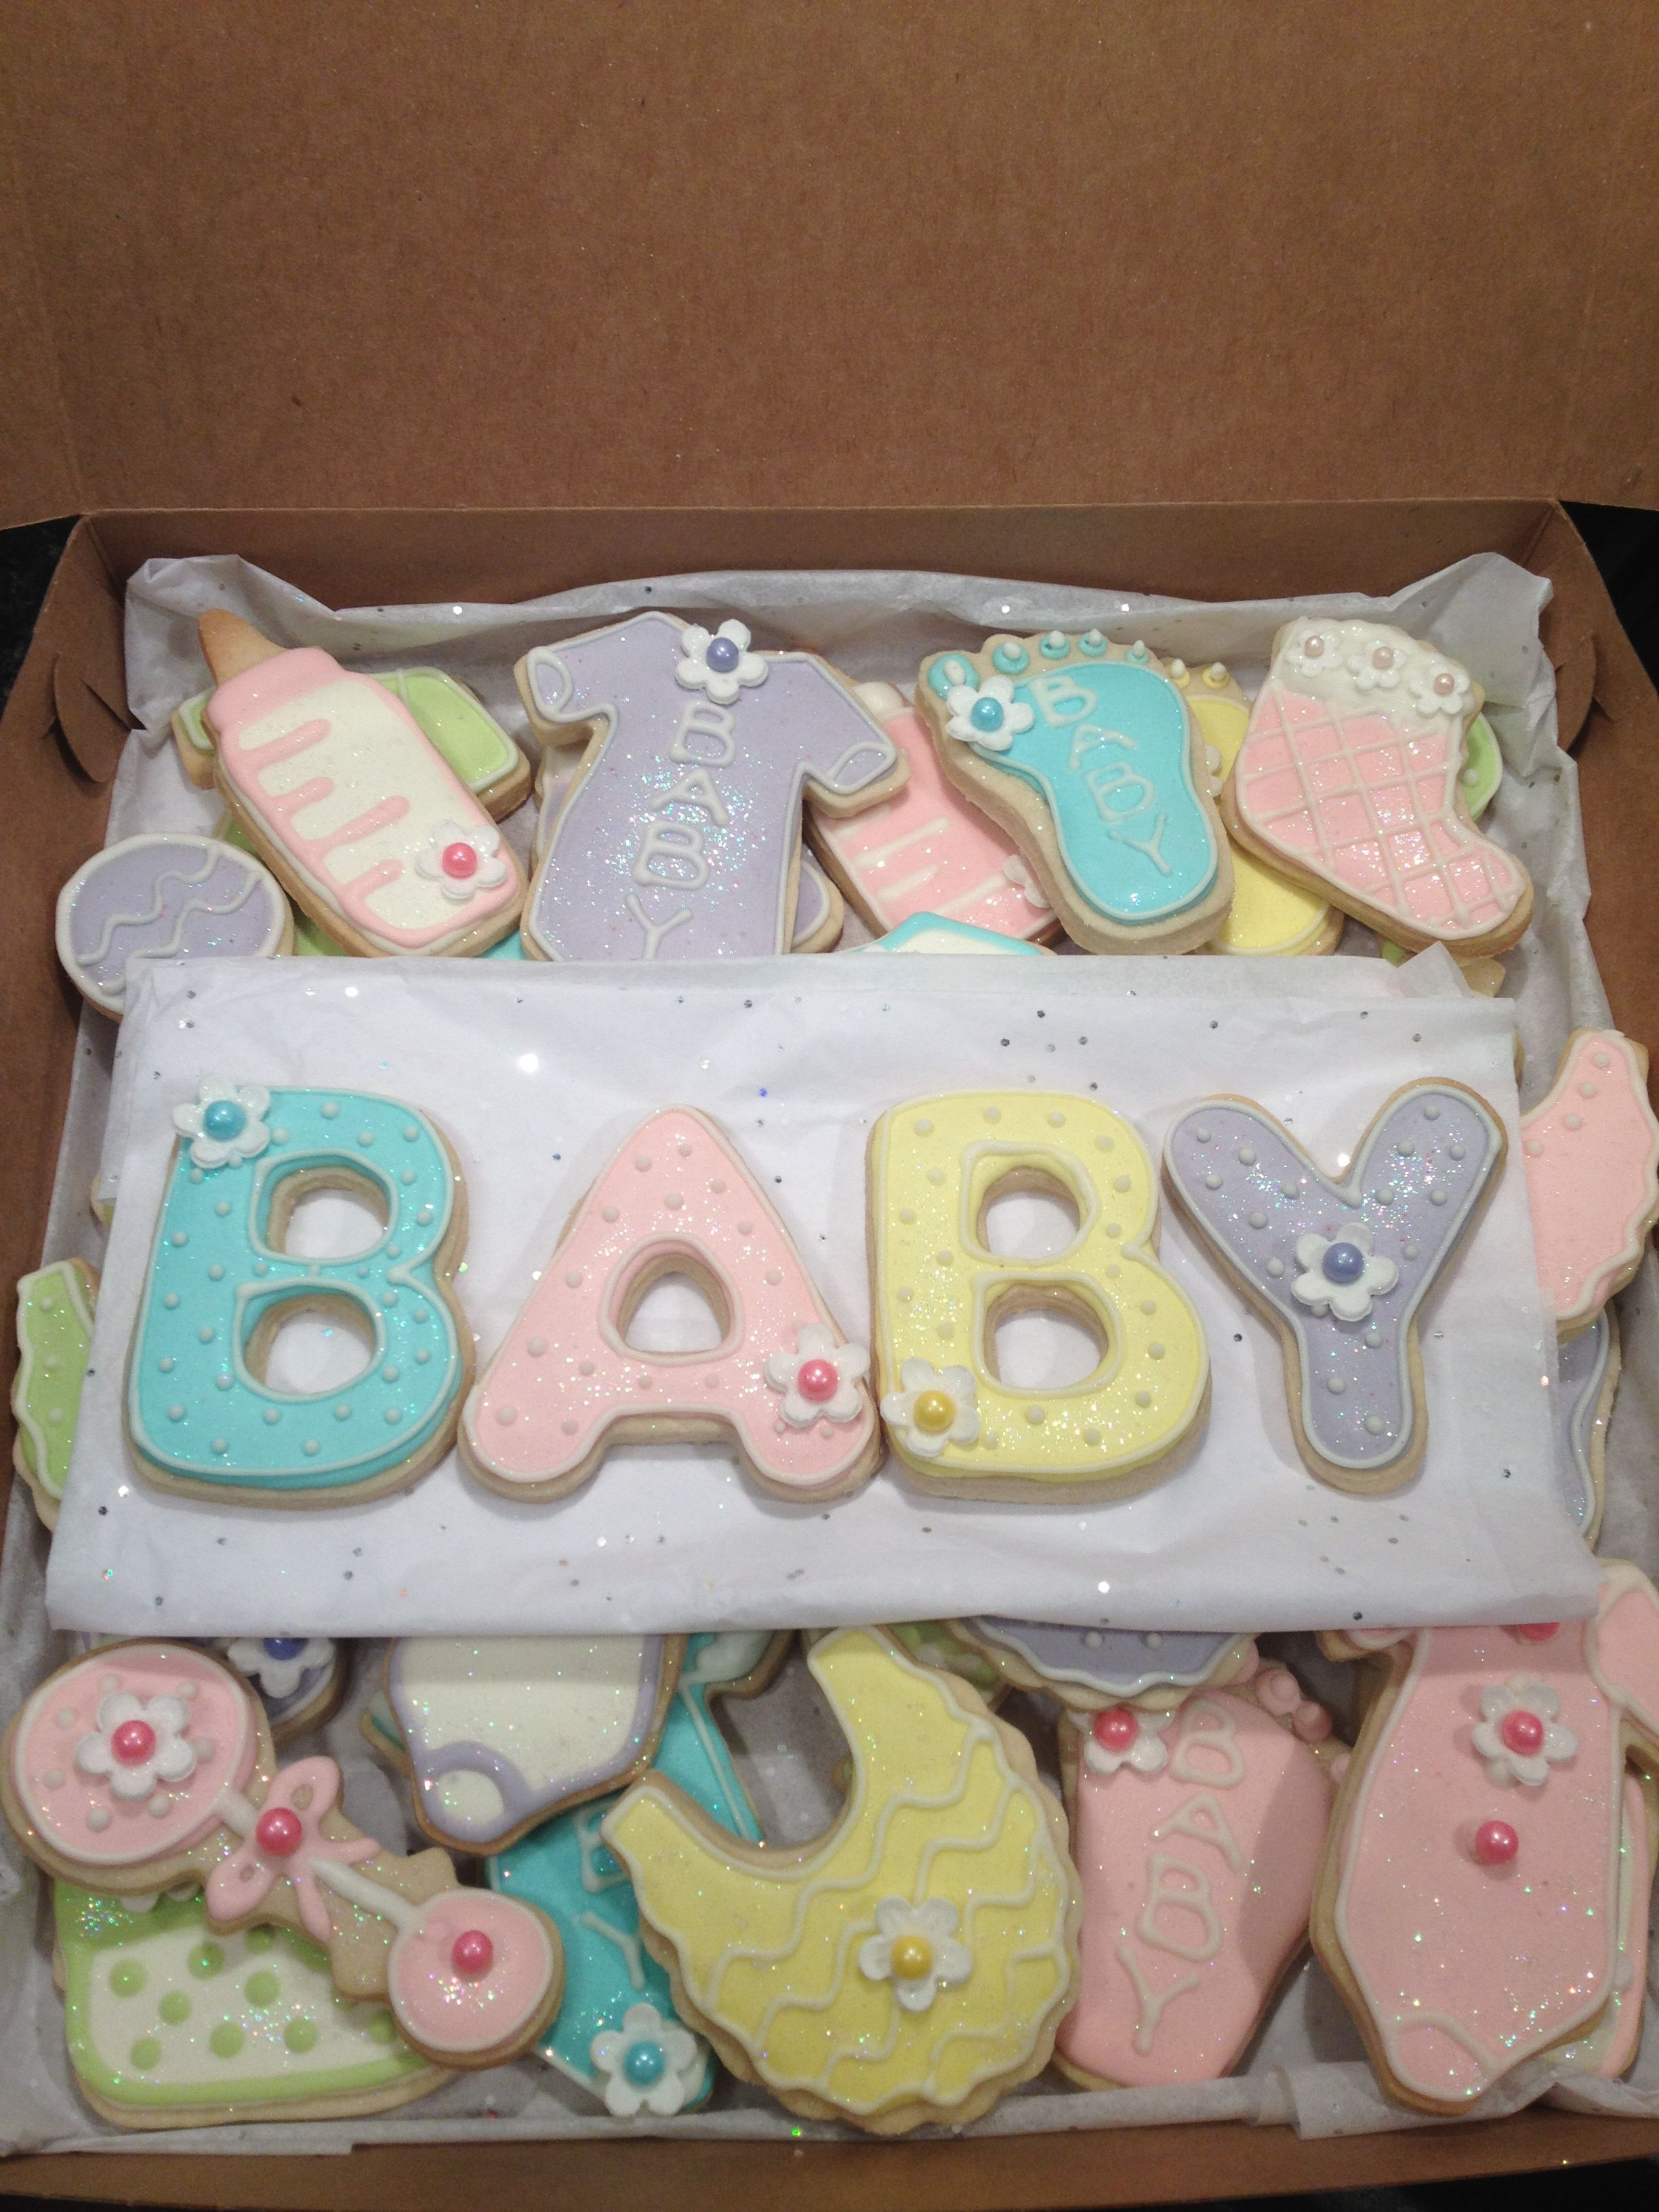 Boy Girl Baby Shower Cookies Ideas Cookies Galletas